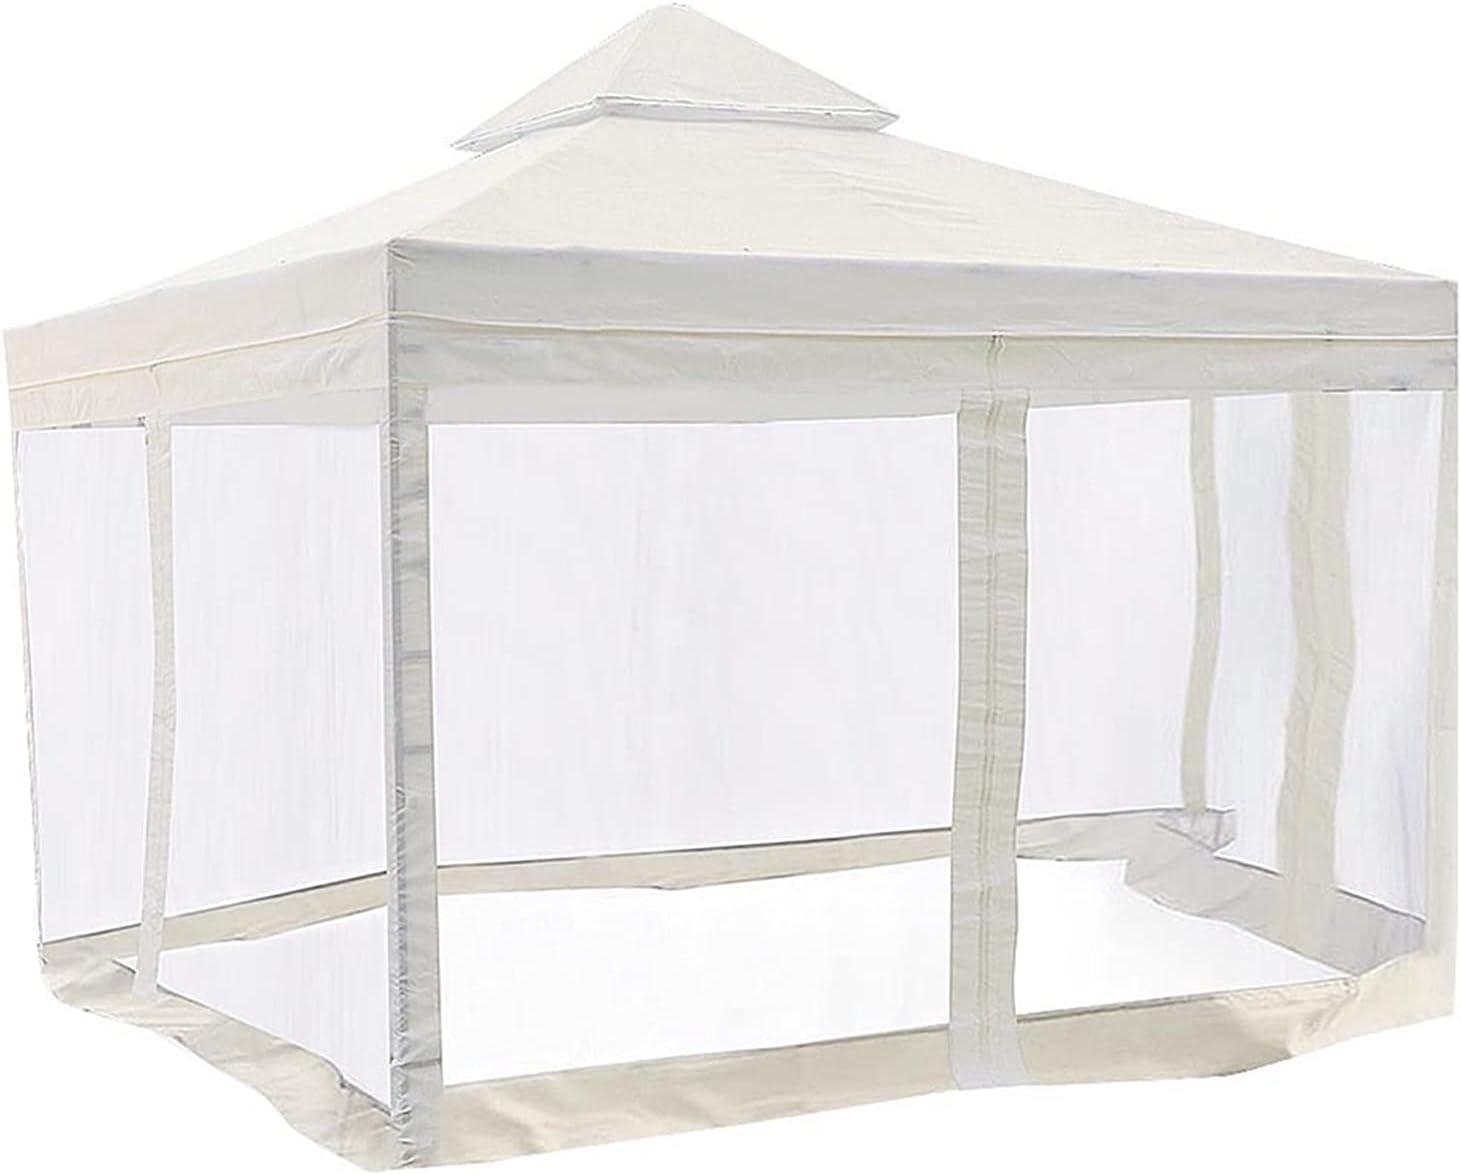 SRAMO 10'x10' Gazebo Tulsa Mall Canopy Replacement 2 Tier 200g UV30+ sqm 2021 model Pa